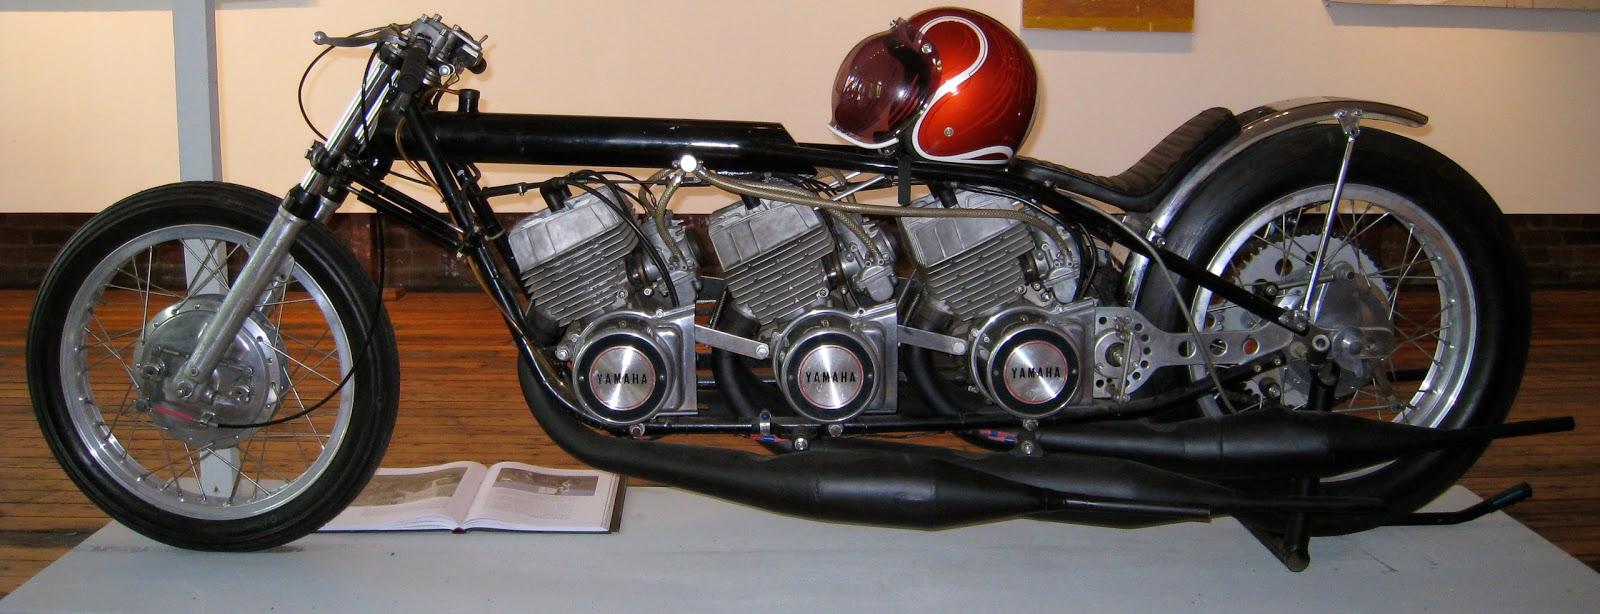 Building Speed: Pat Miller\'s triple-engine Yamaha